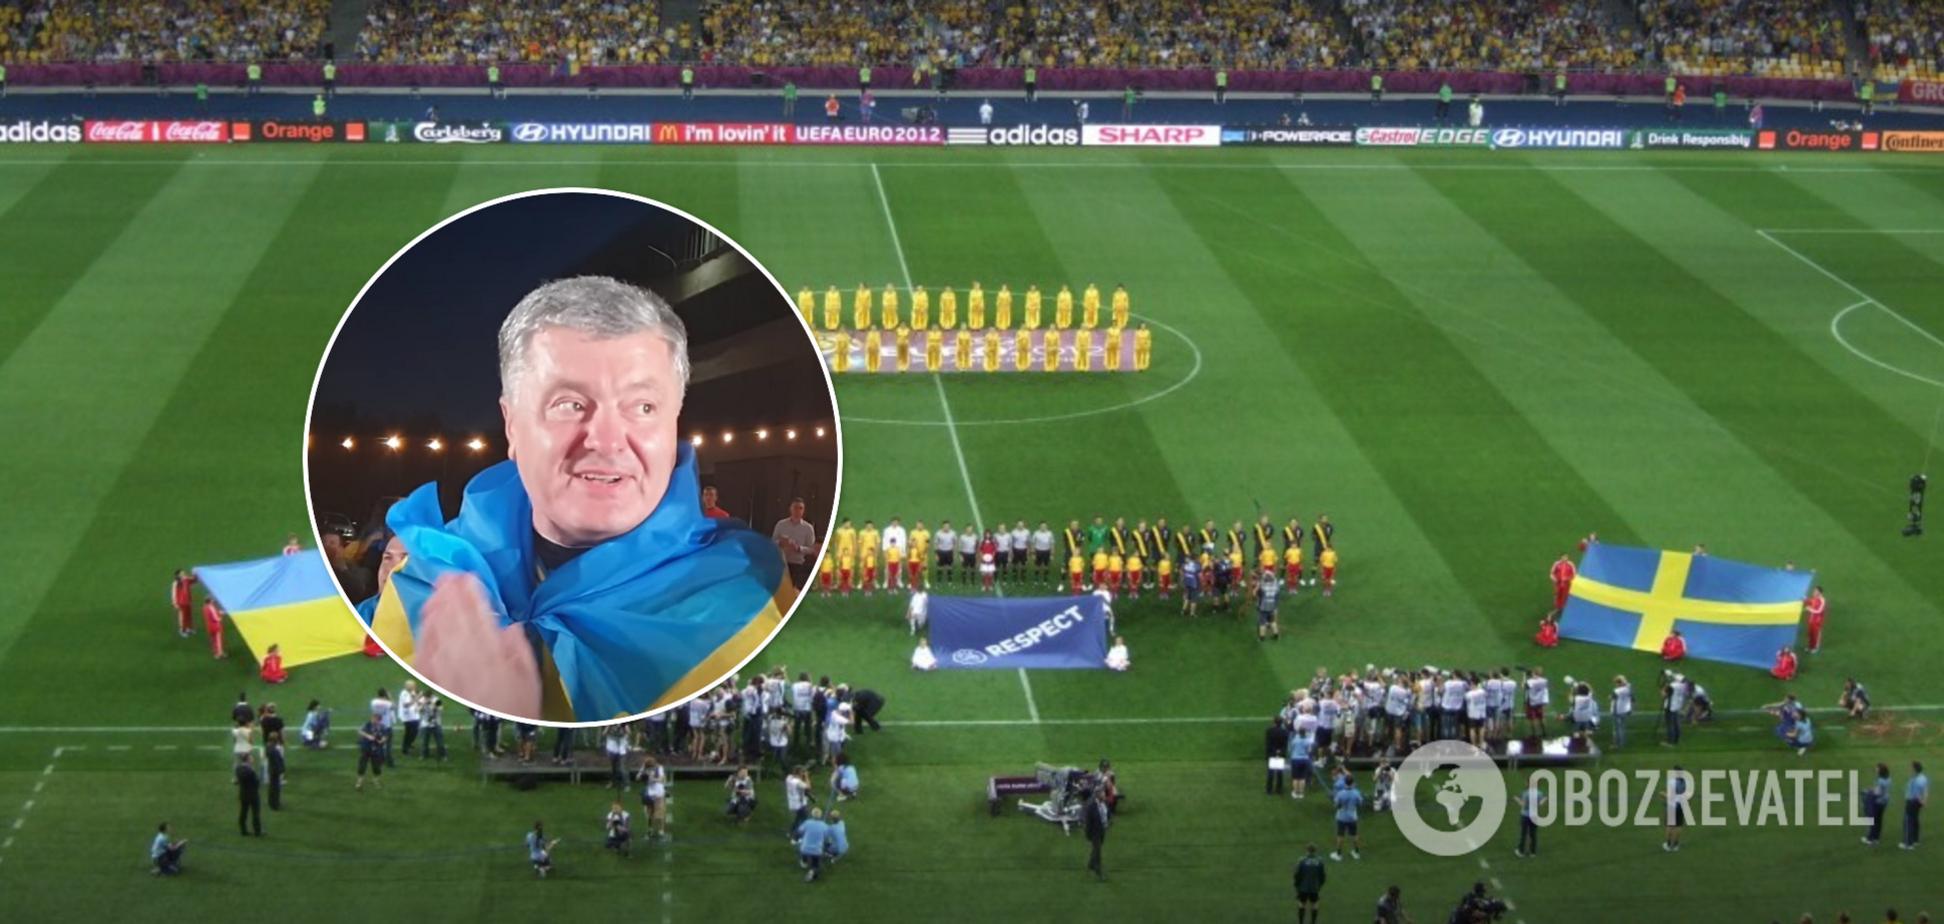 Порошенко с депутатами 'ЕС' болели за Украину во время матча со Швецией: видео реакции на гол